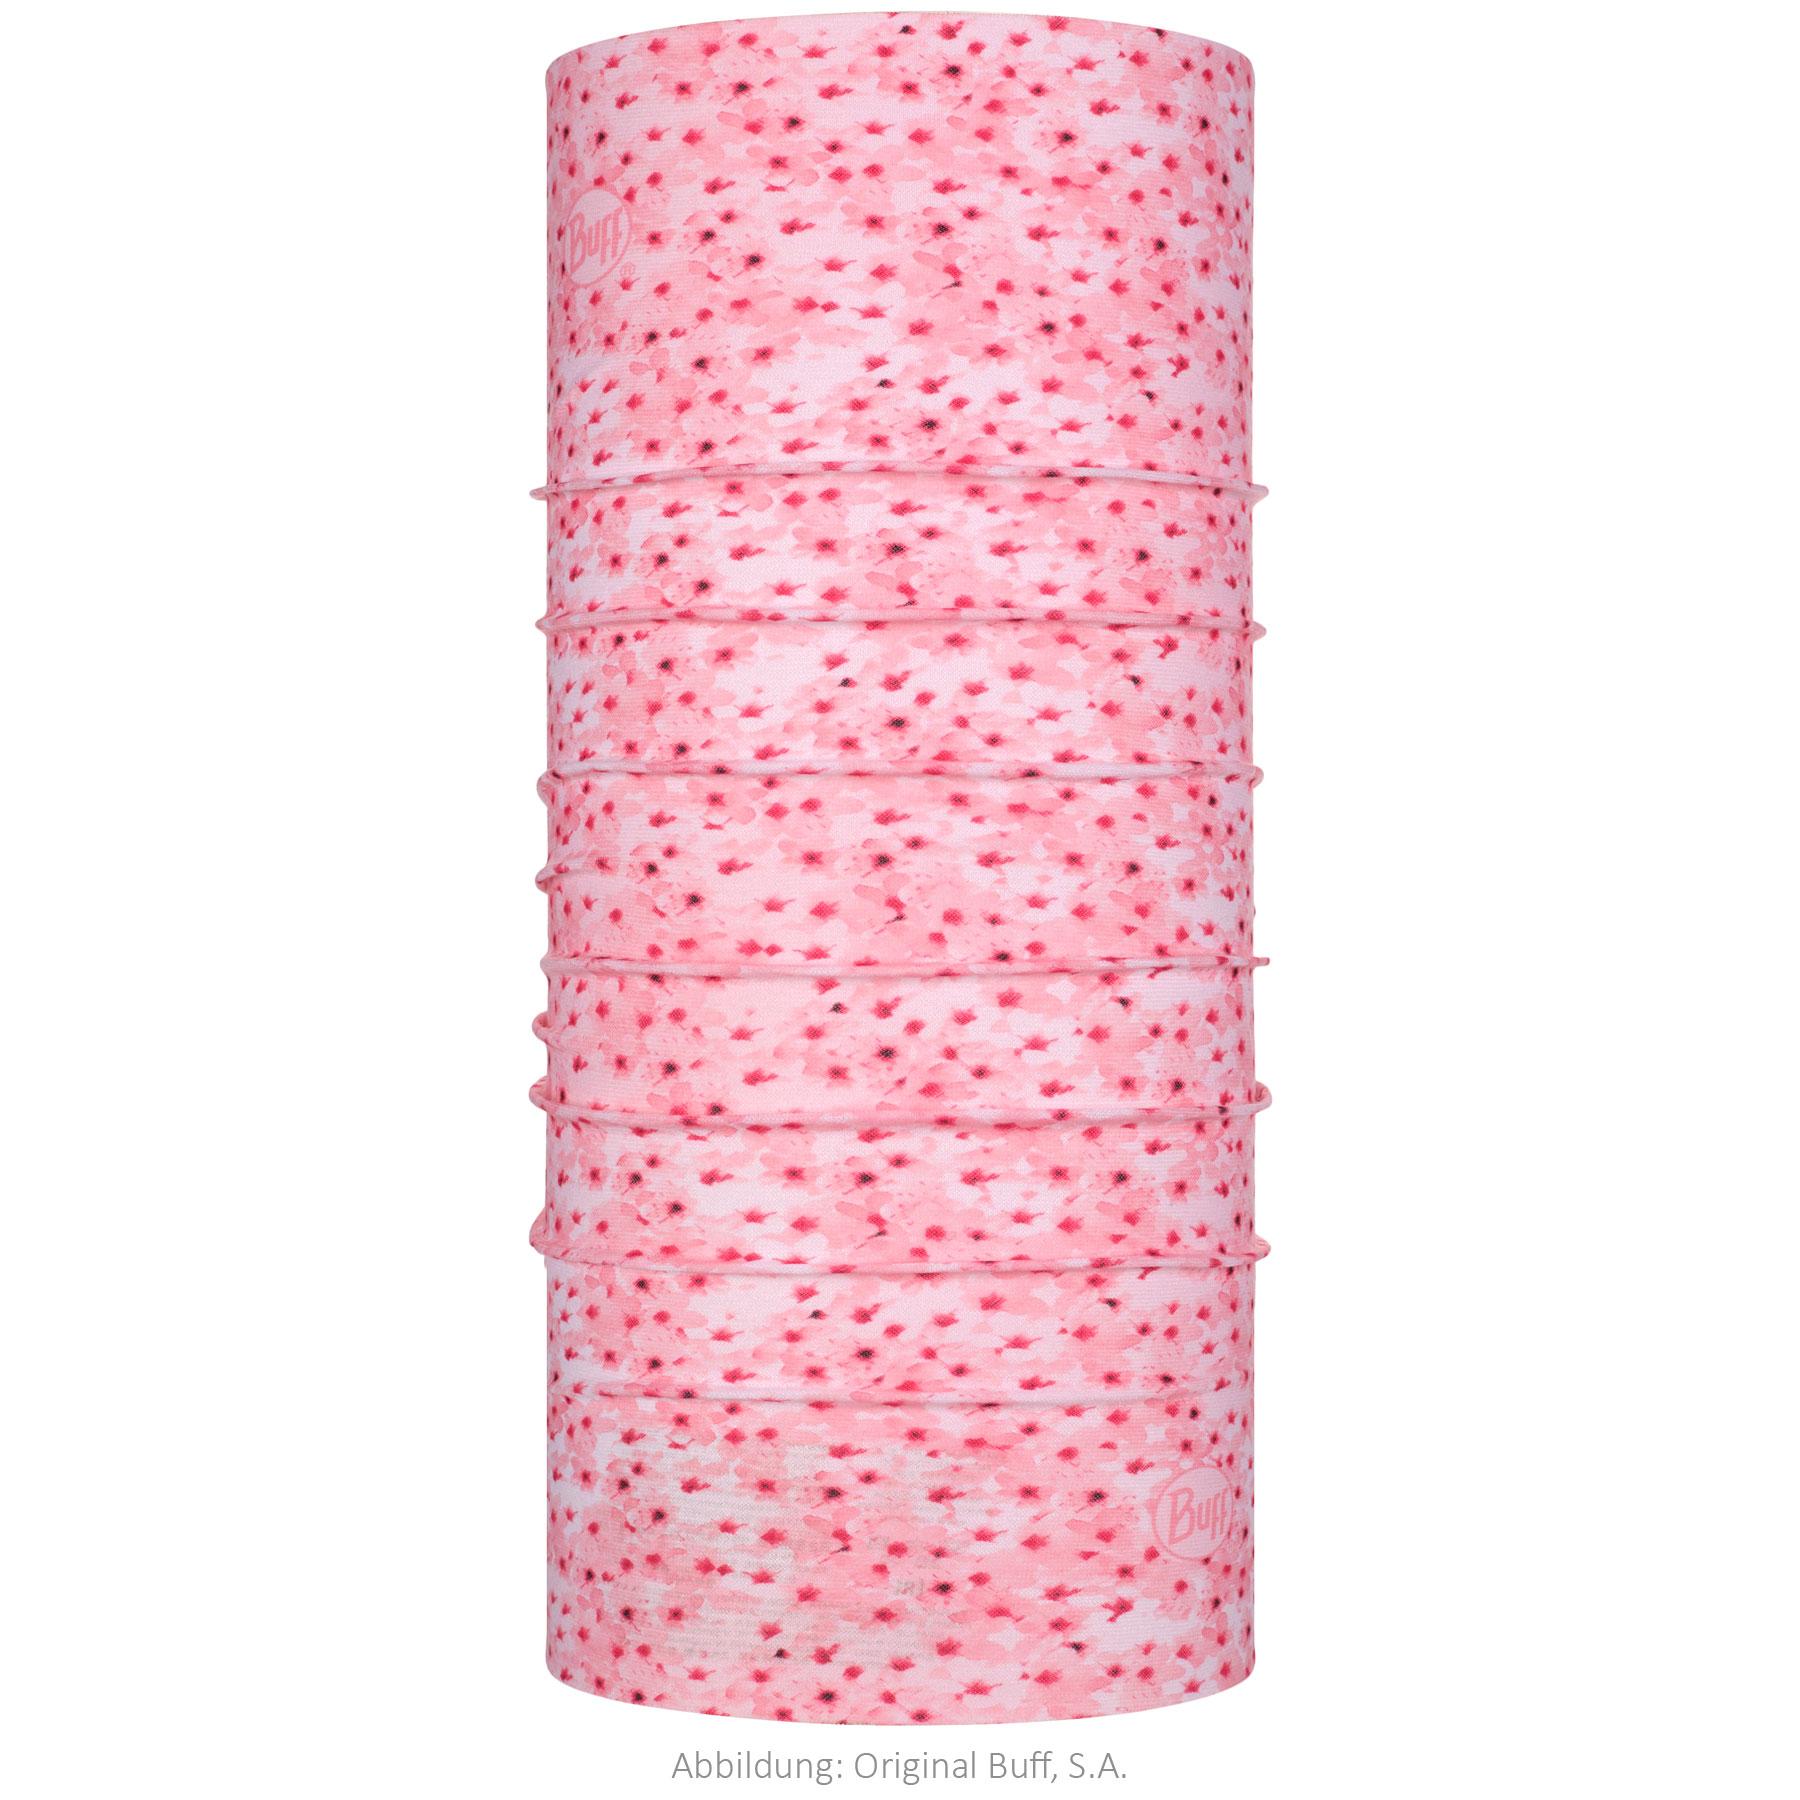 Buff® Original Multifunctional Cloth Baby - Daydream Pink